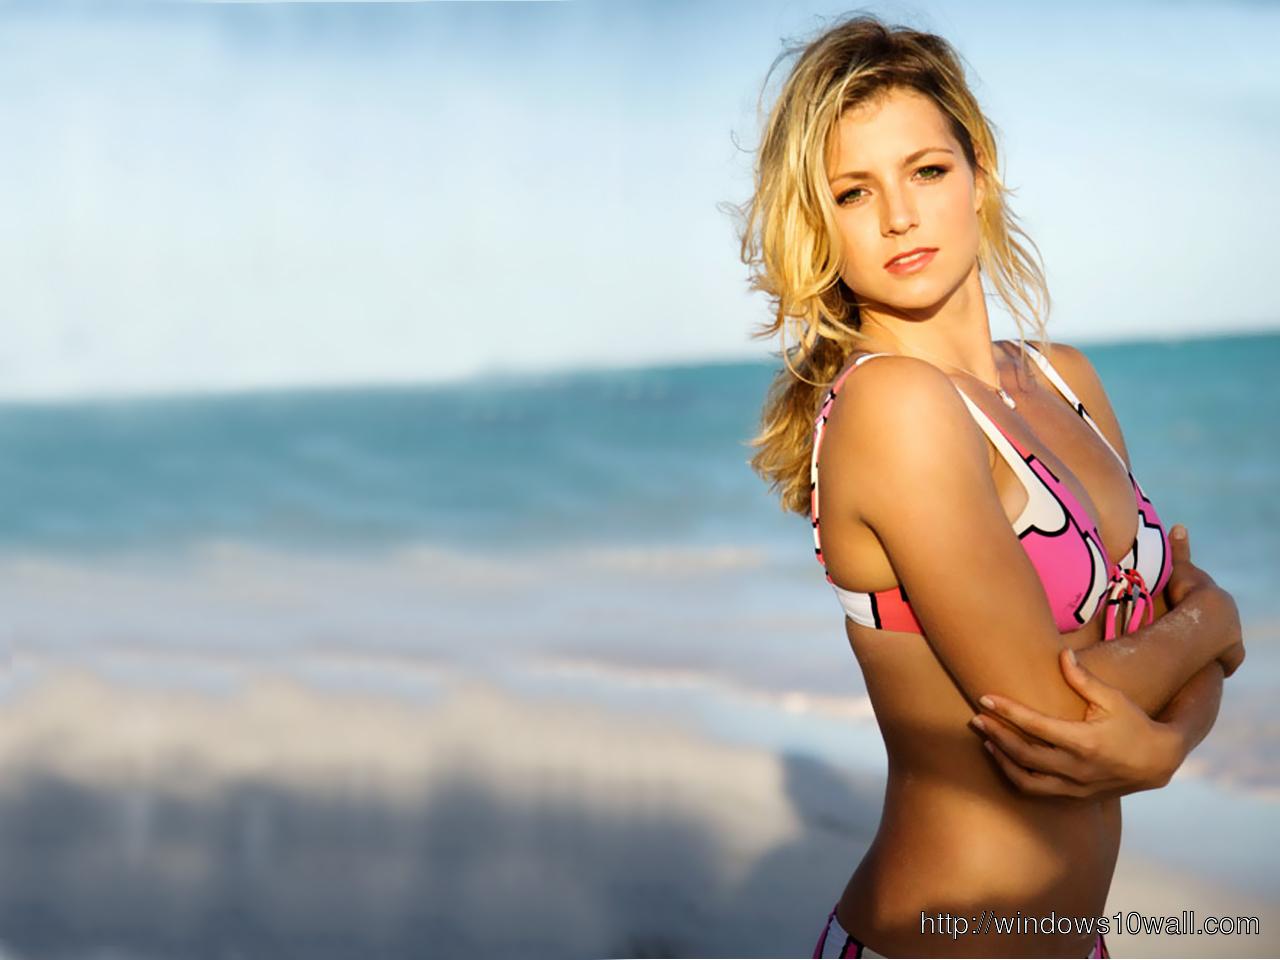 Maria Kirilenko Hot n Sexy Beach Side Wallpaper